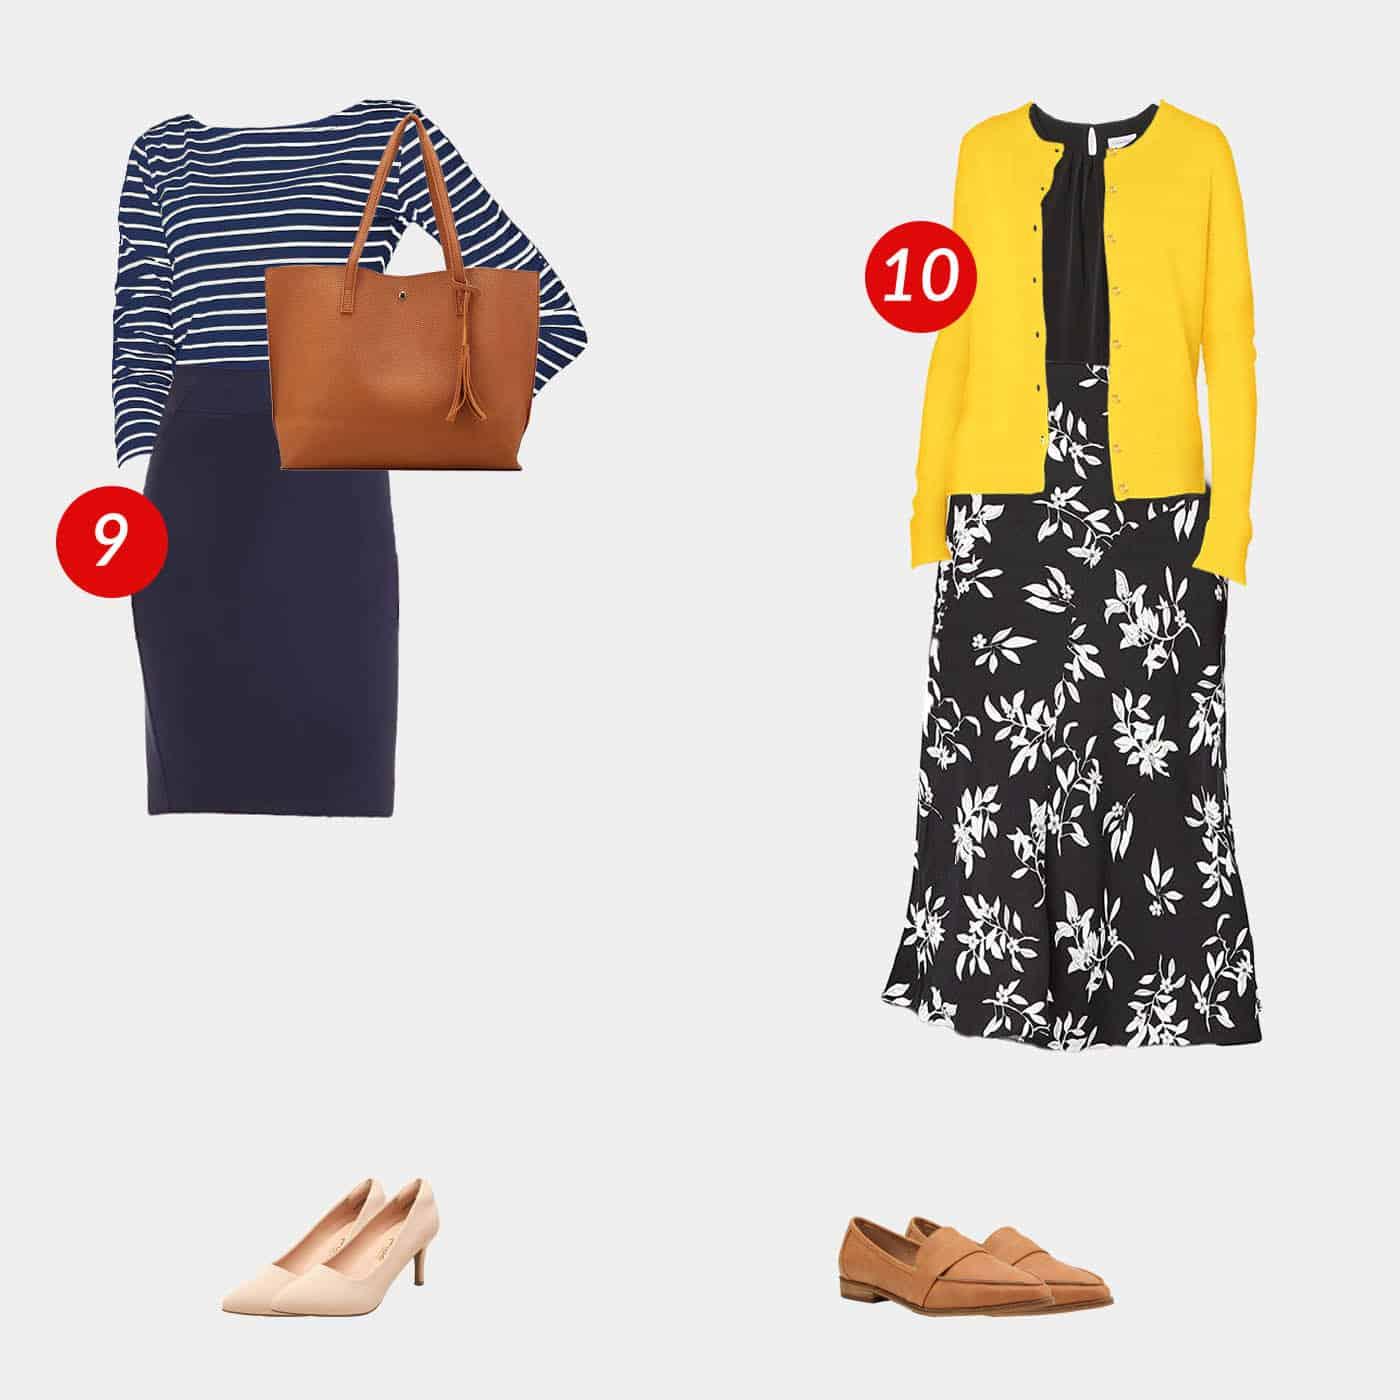 18 Piece Business Casual Amazon Capsule Wardrobe 6